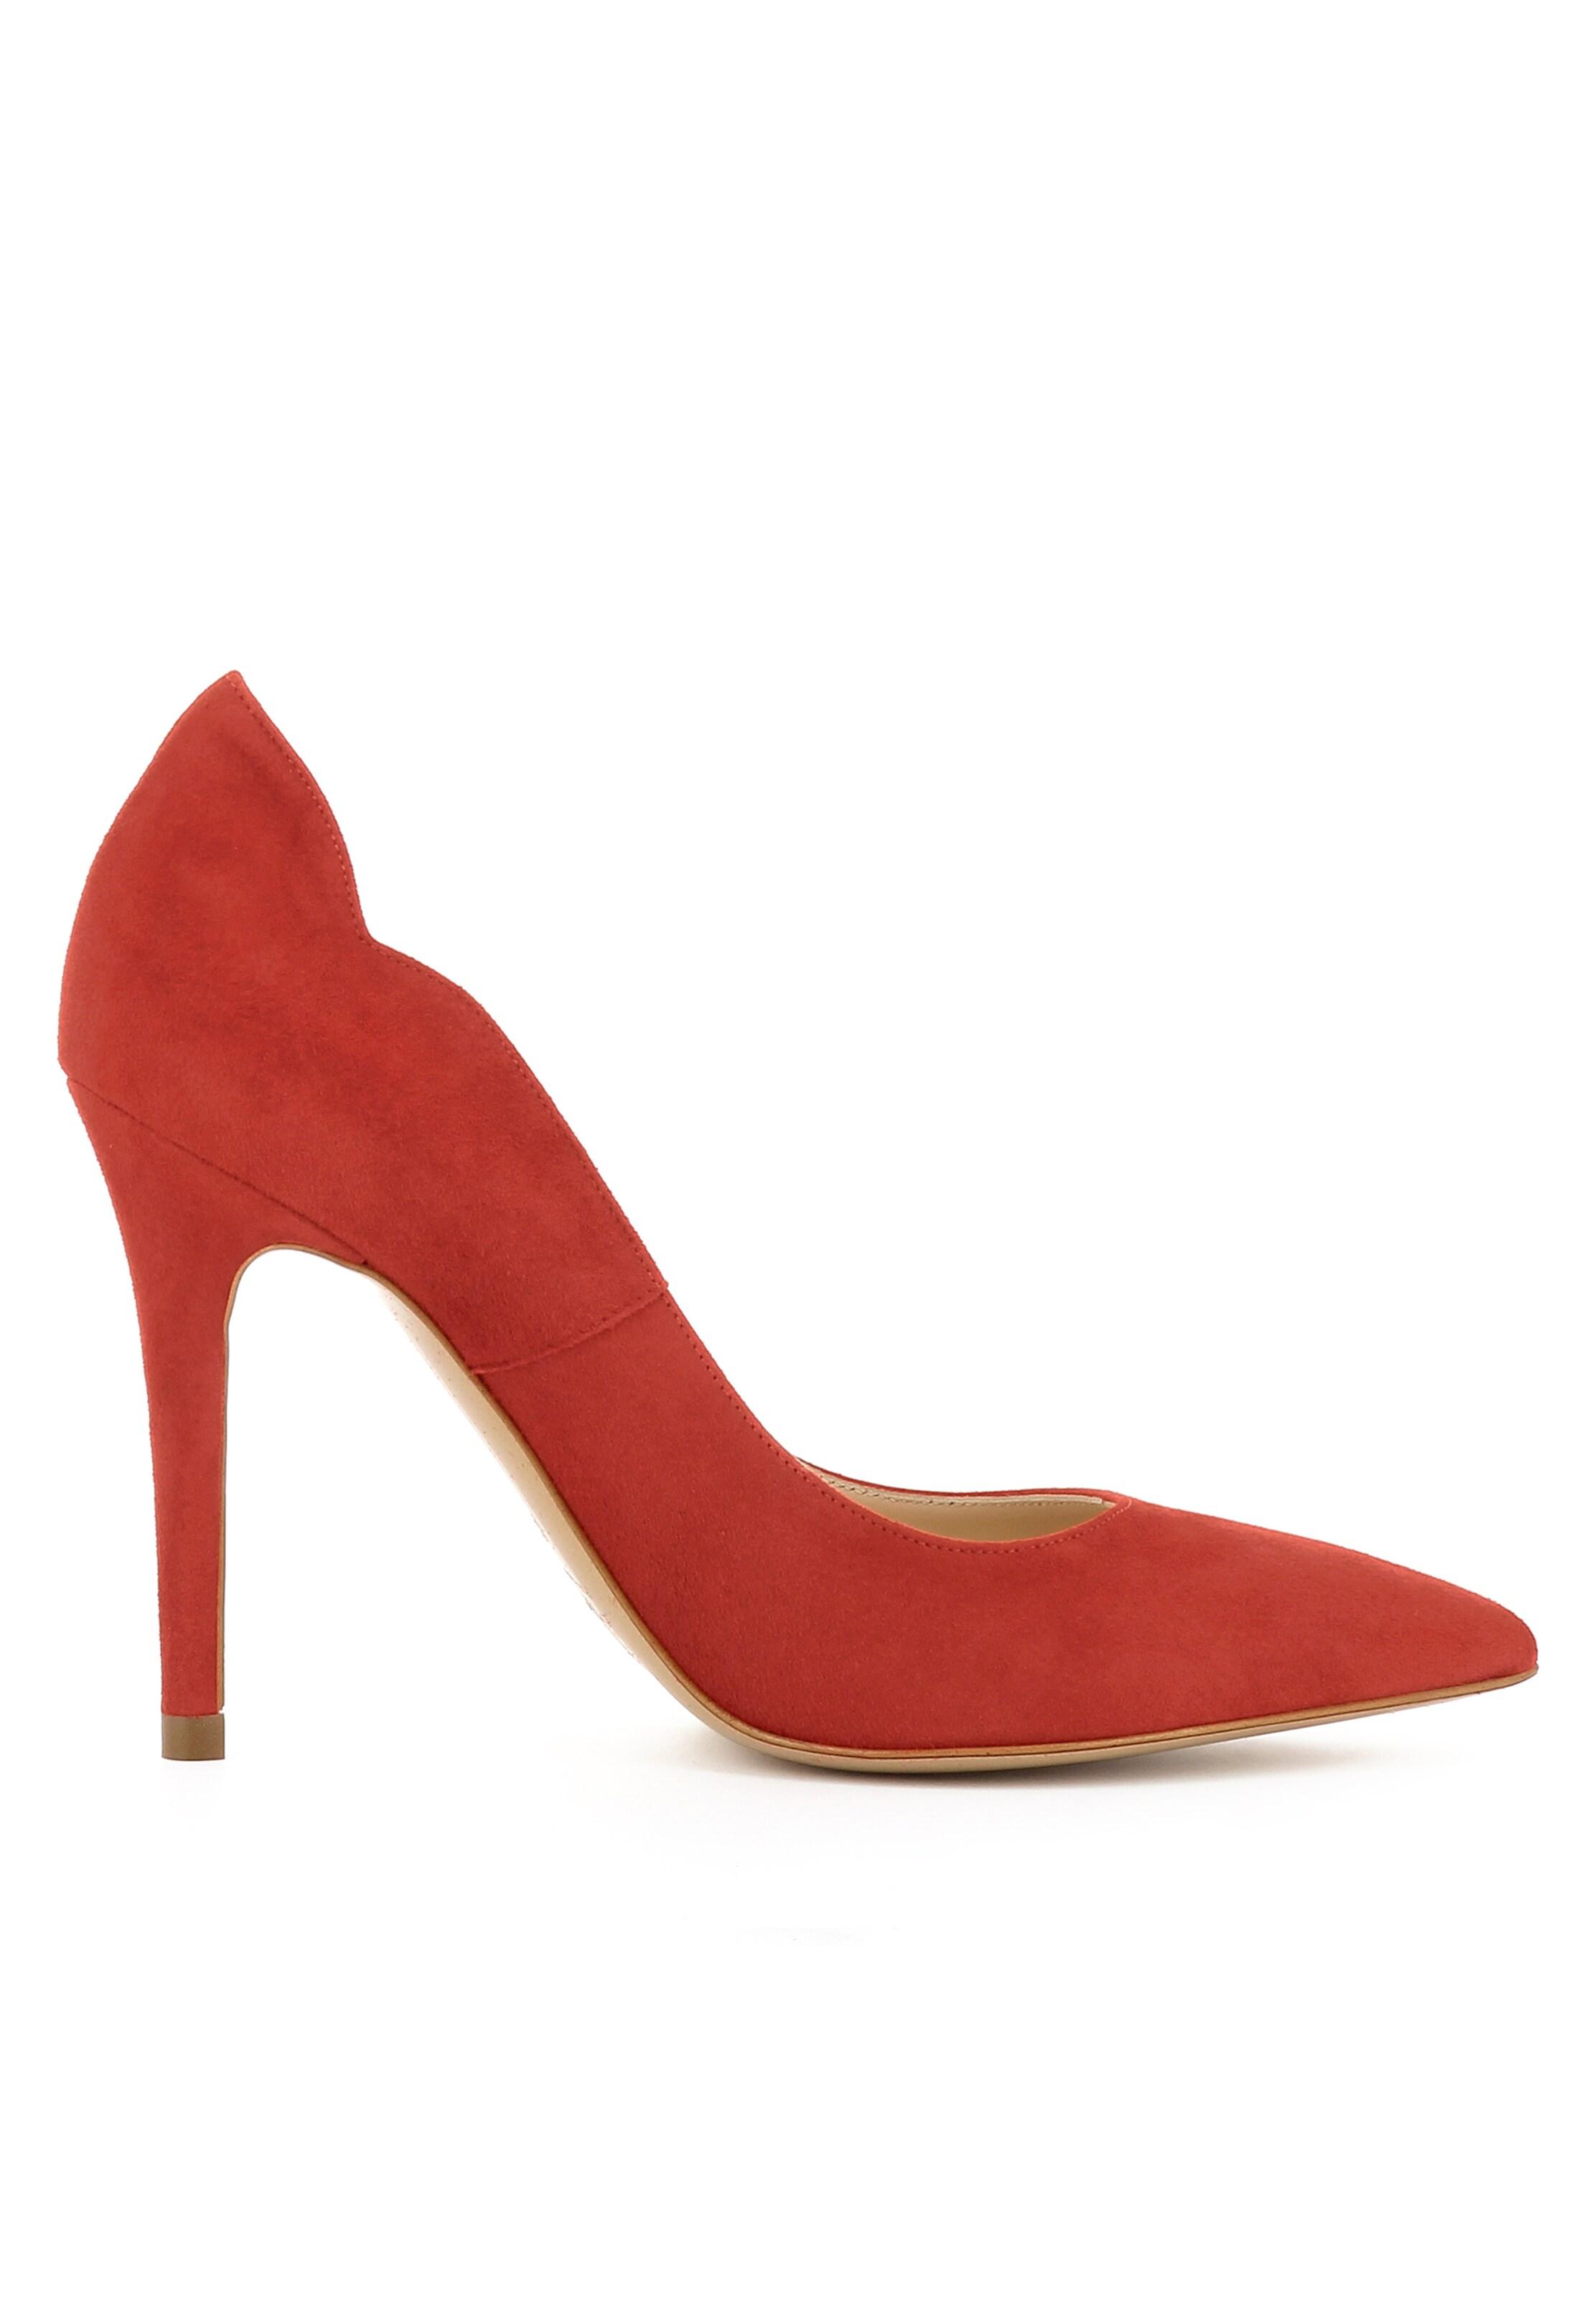 Evita En Escarpins En Evita Escarpins Rouge Rouge xordCBe